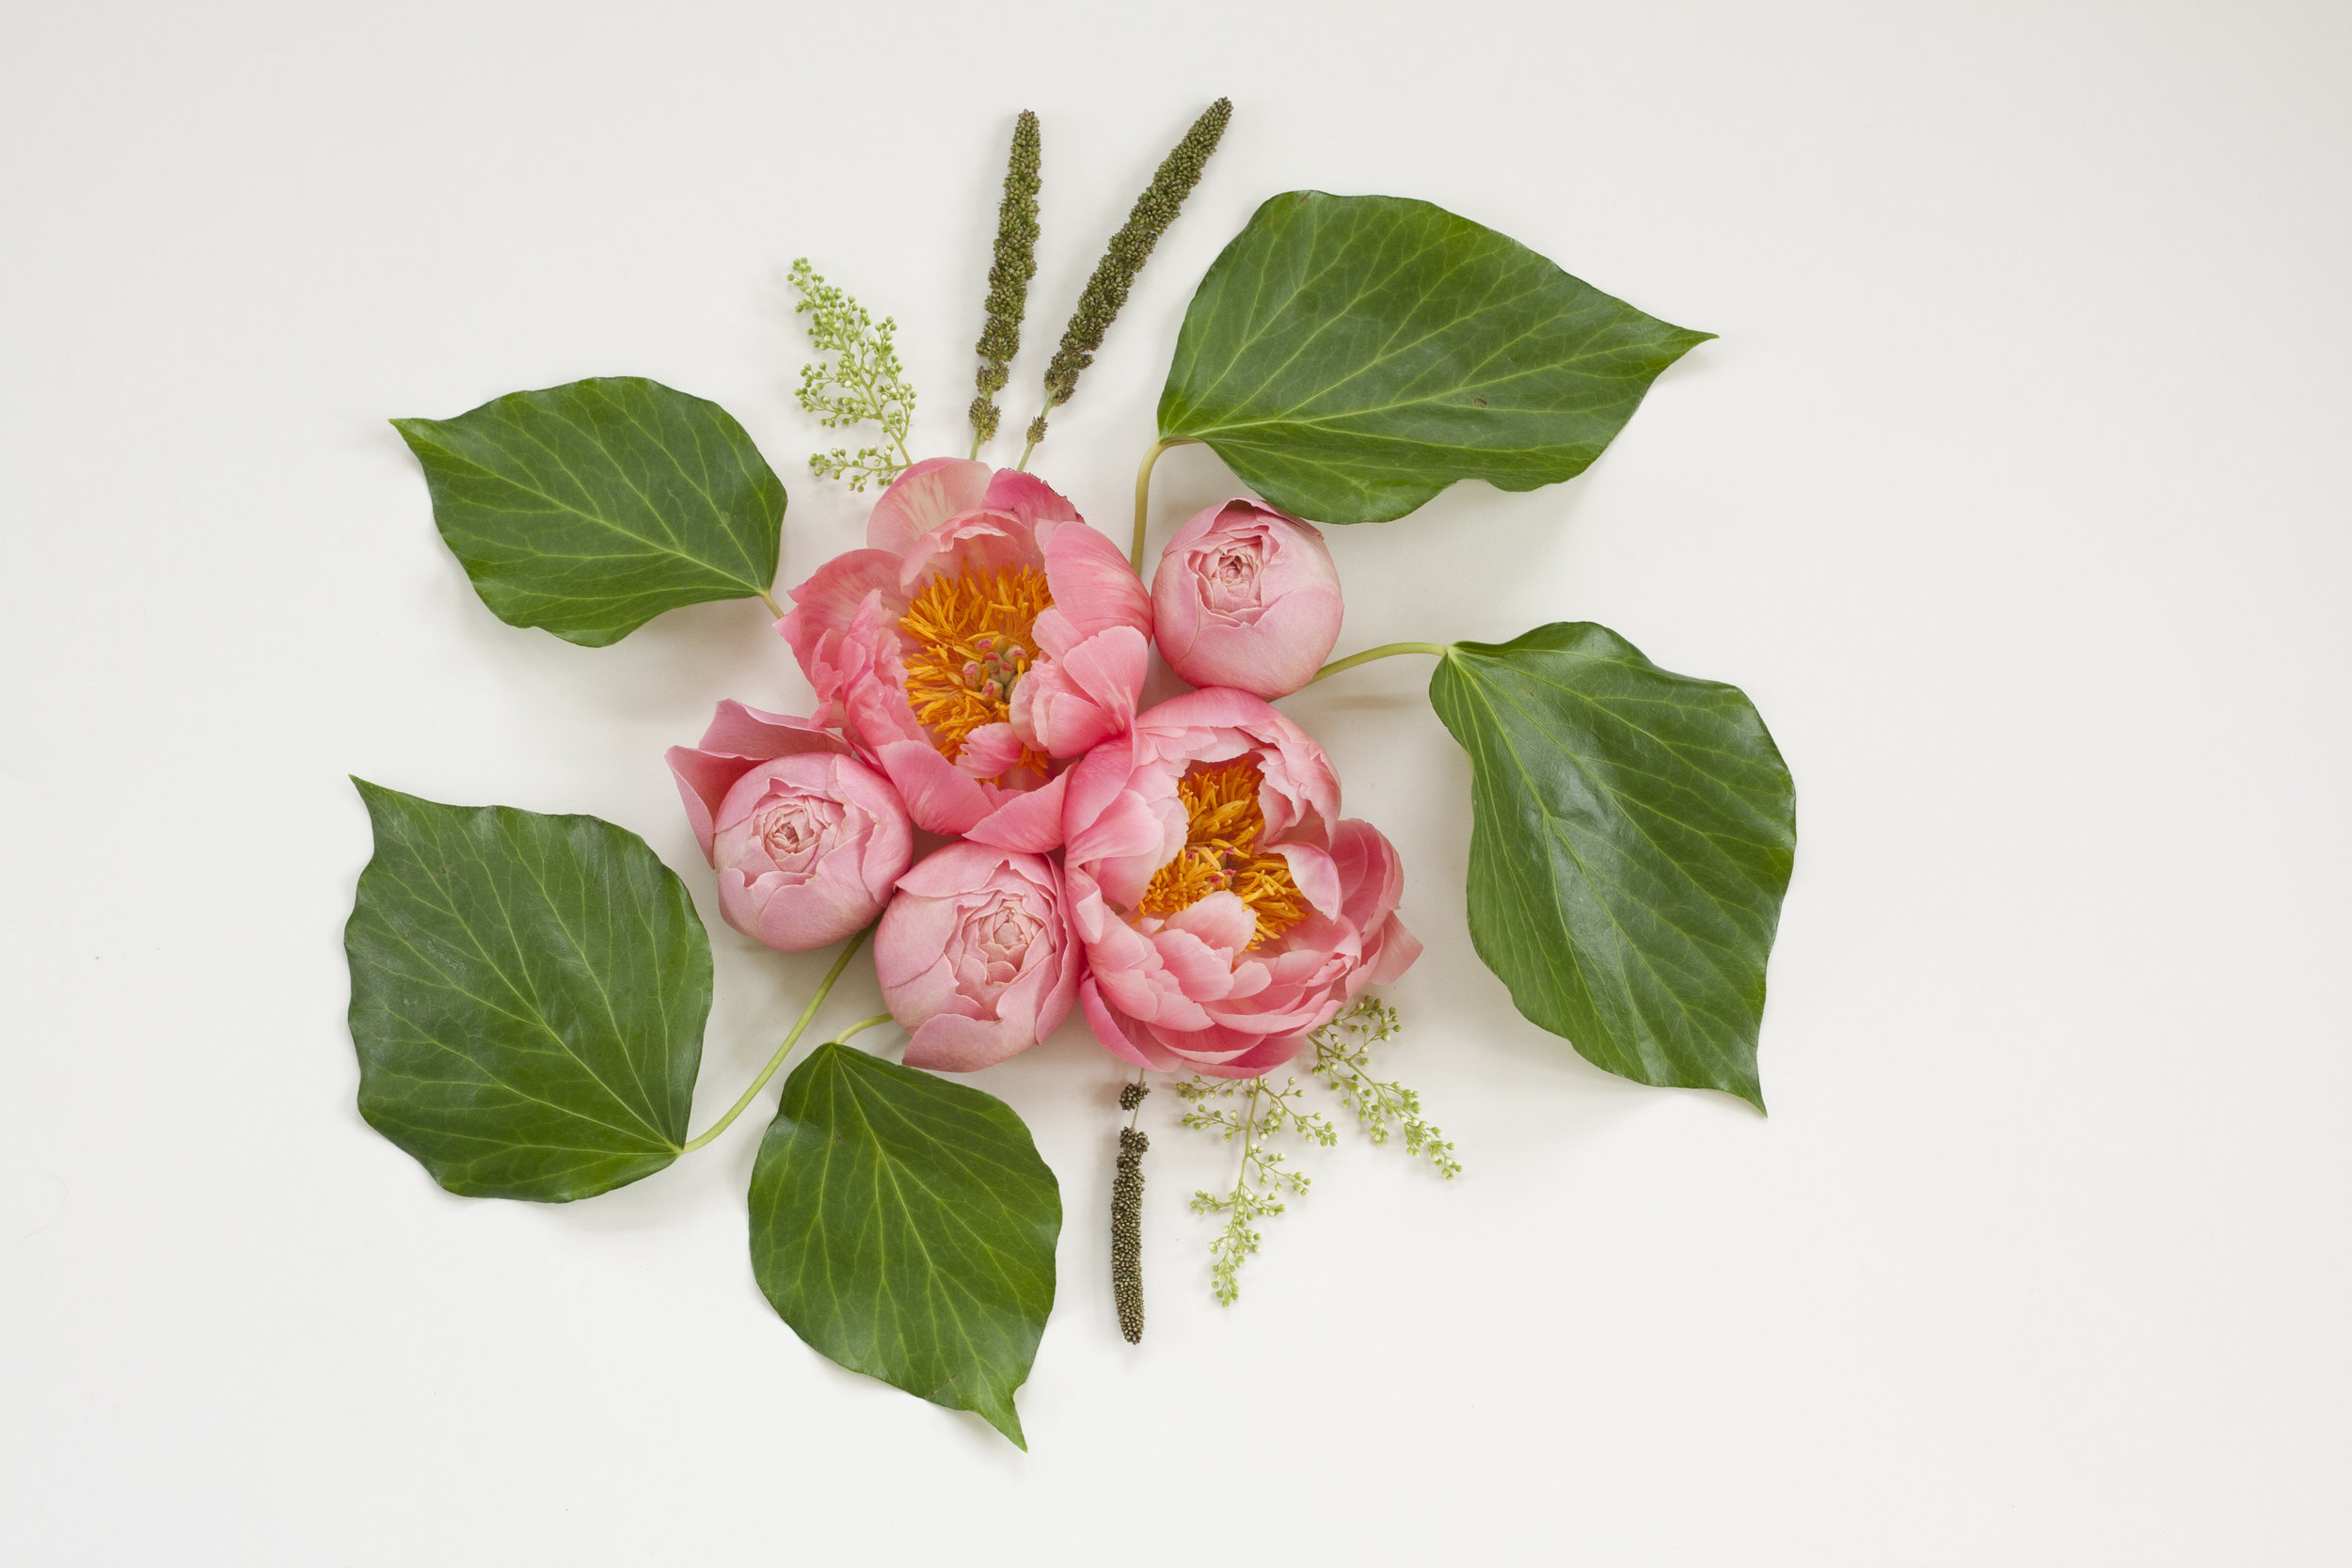 Deconstructed Bouquet